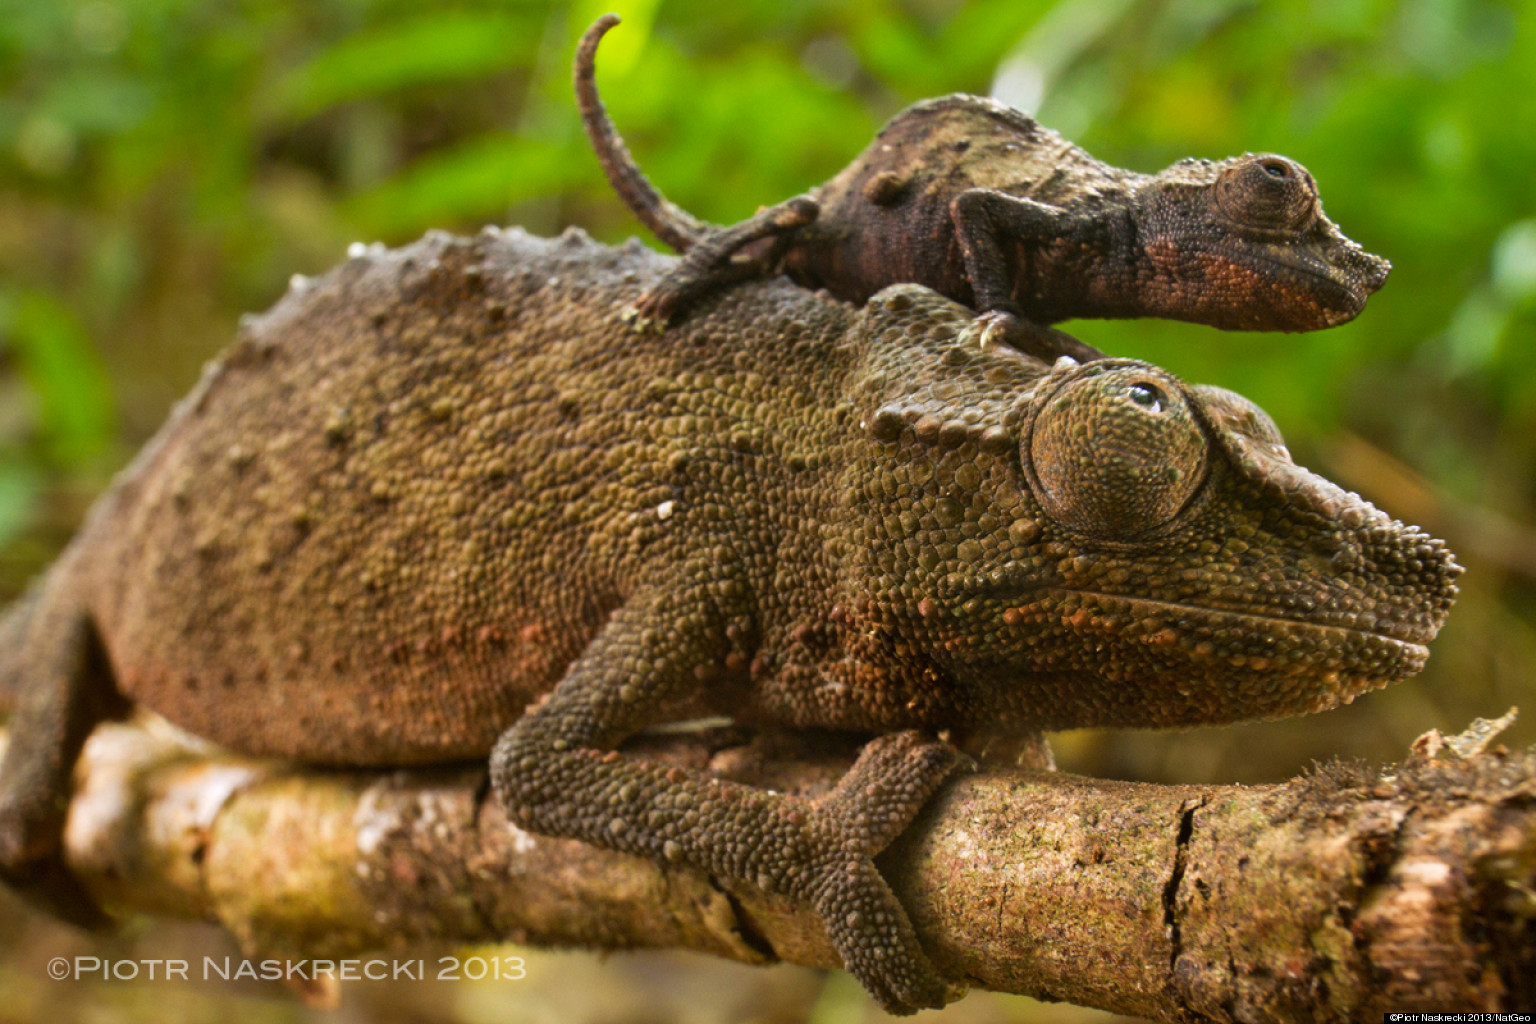 Indian Chameleon Ecosia